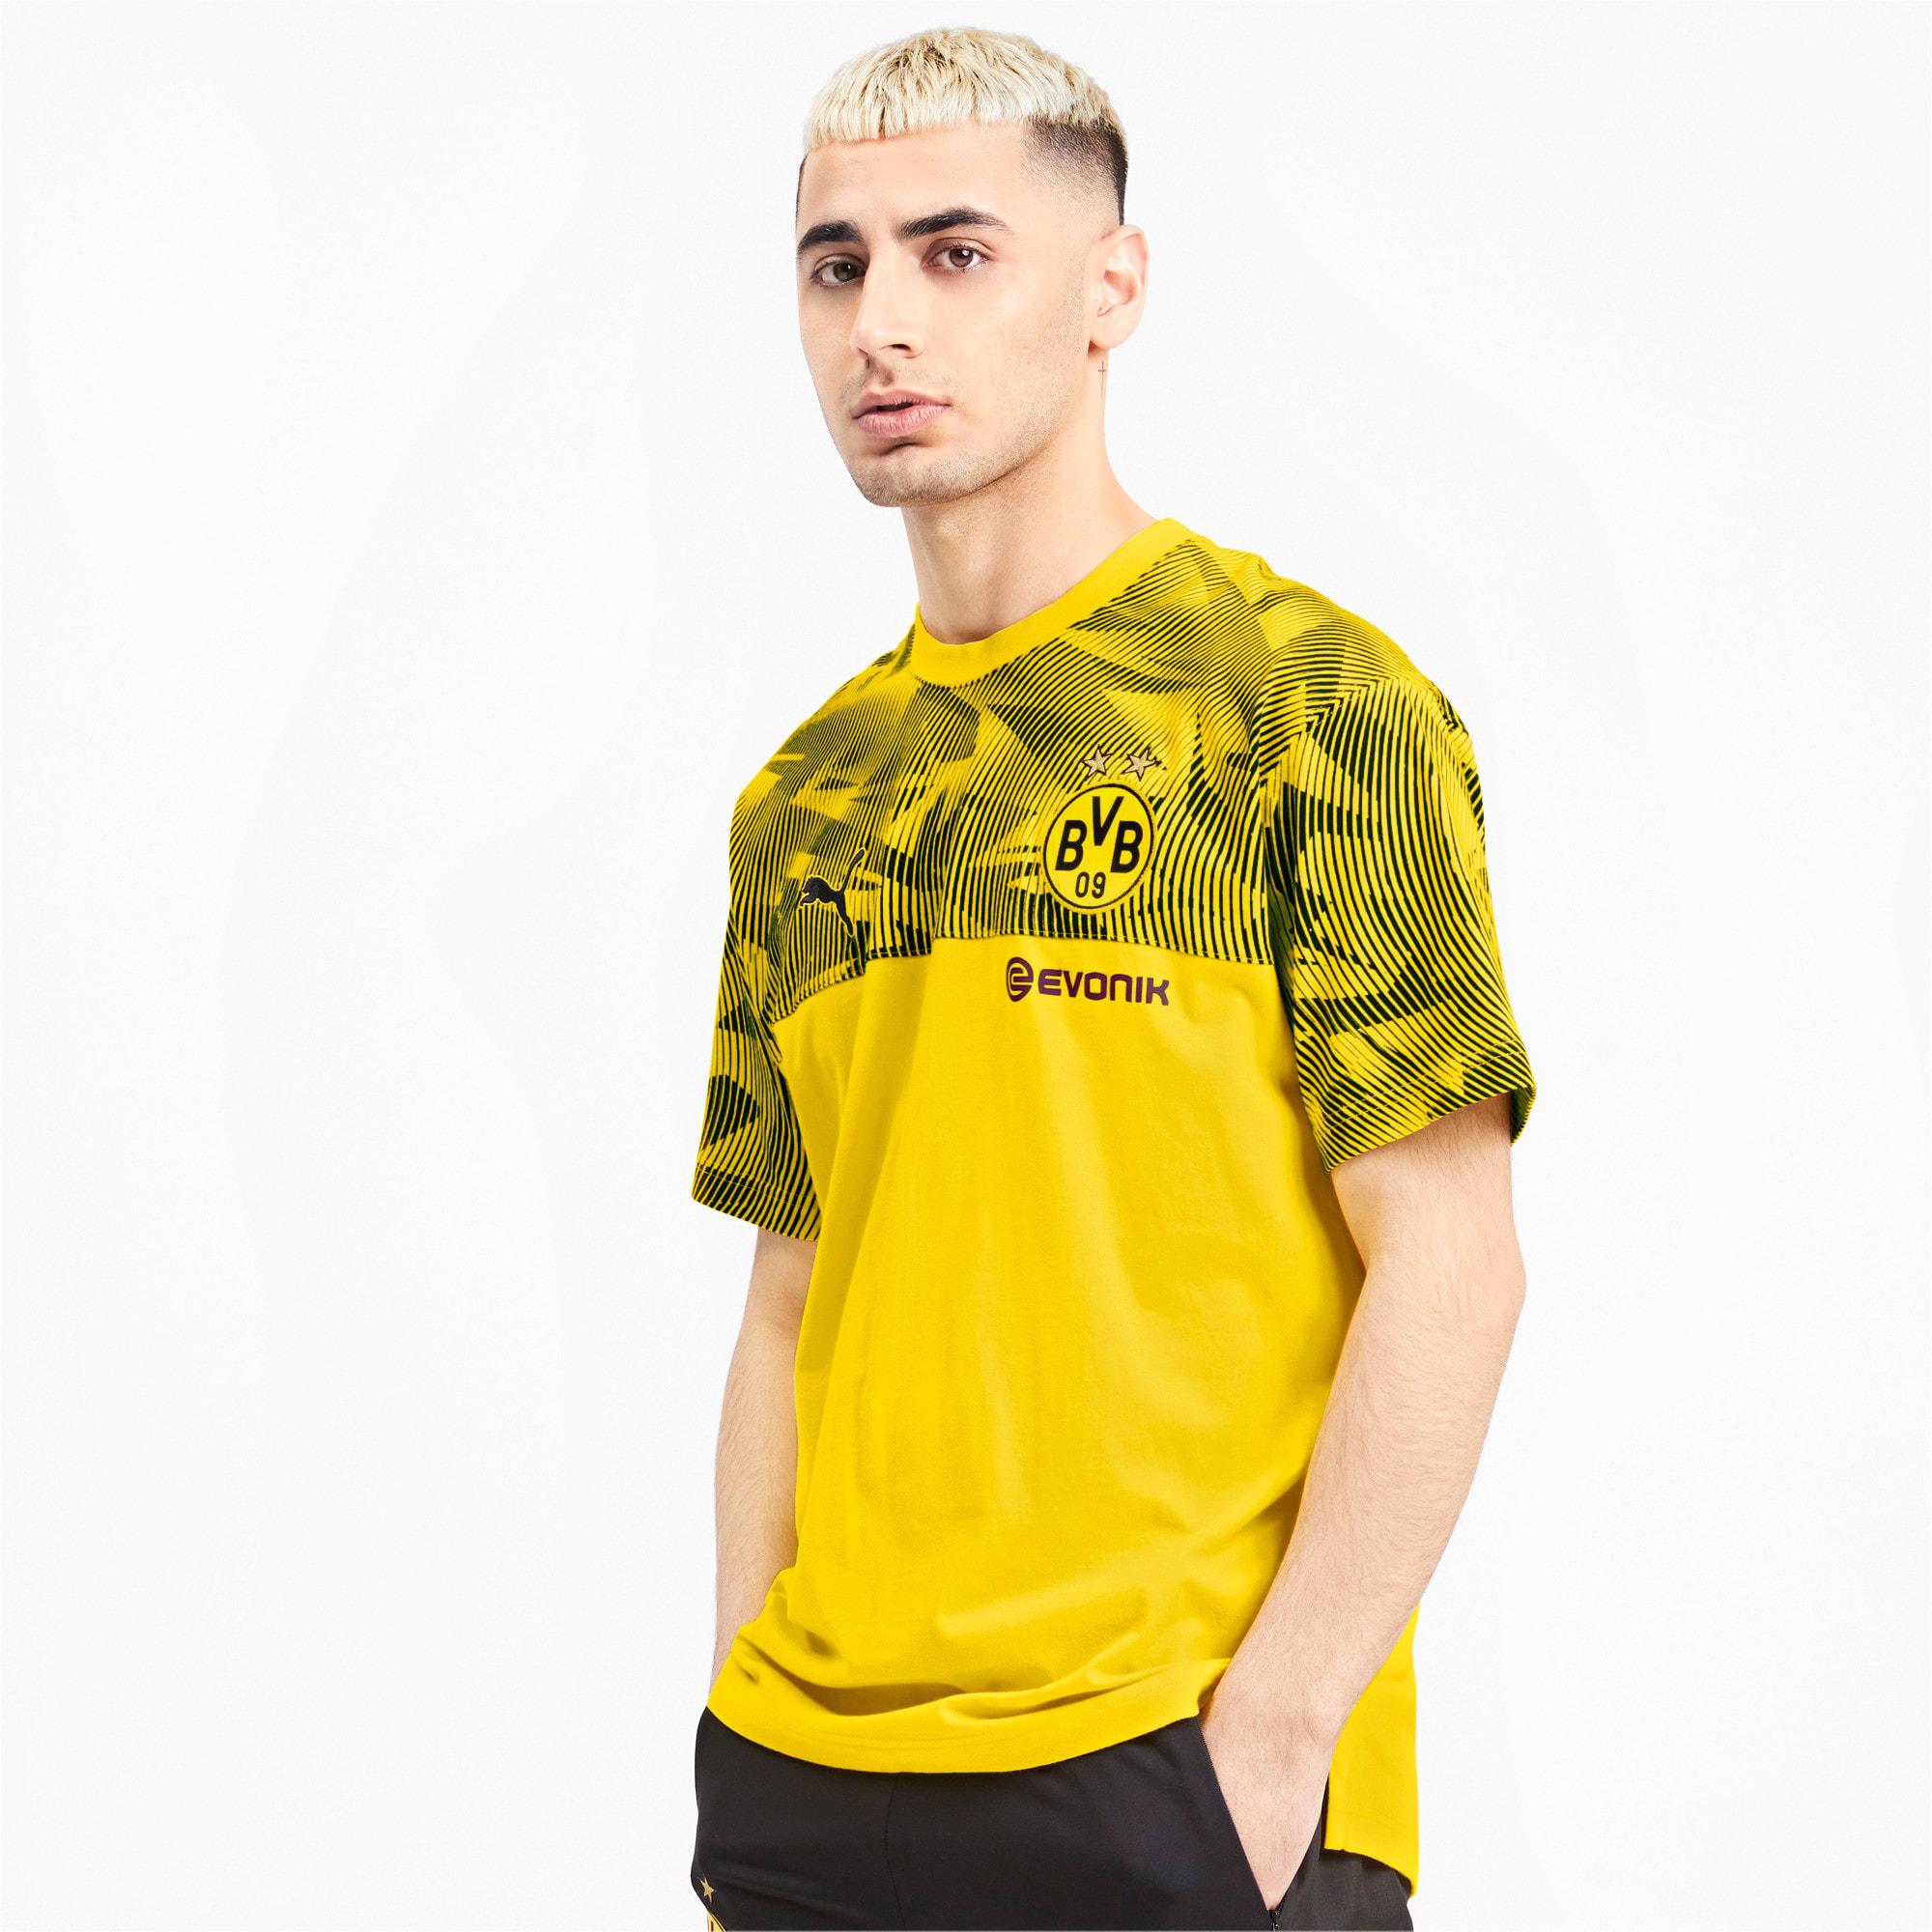 Thumbnail 1 of BVB Casuals Men's Tee, Cyber Yellow-Puma Black, medium